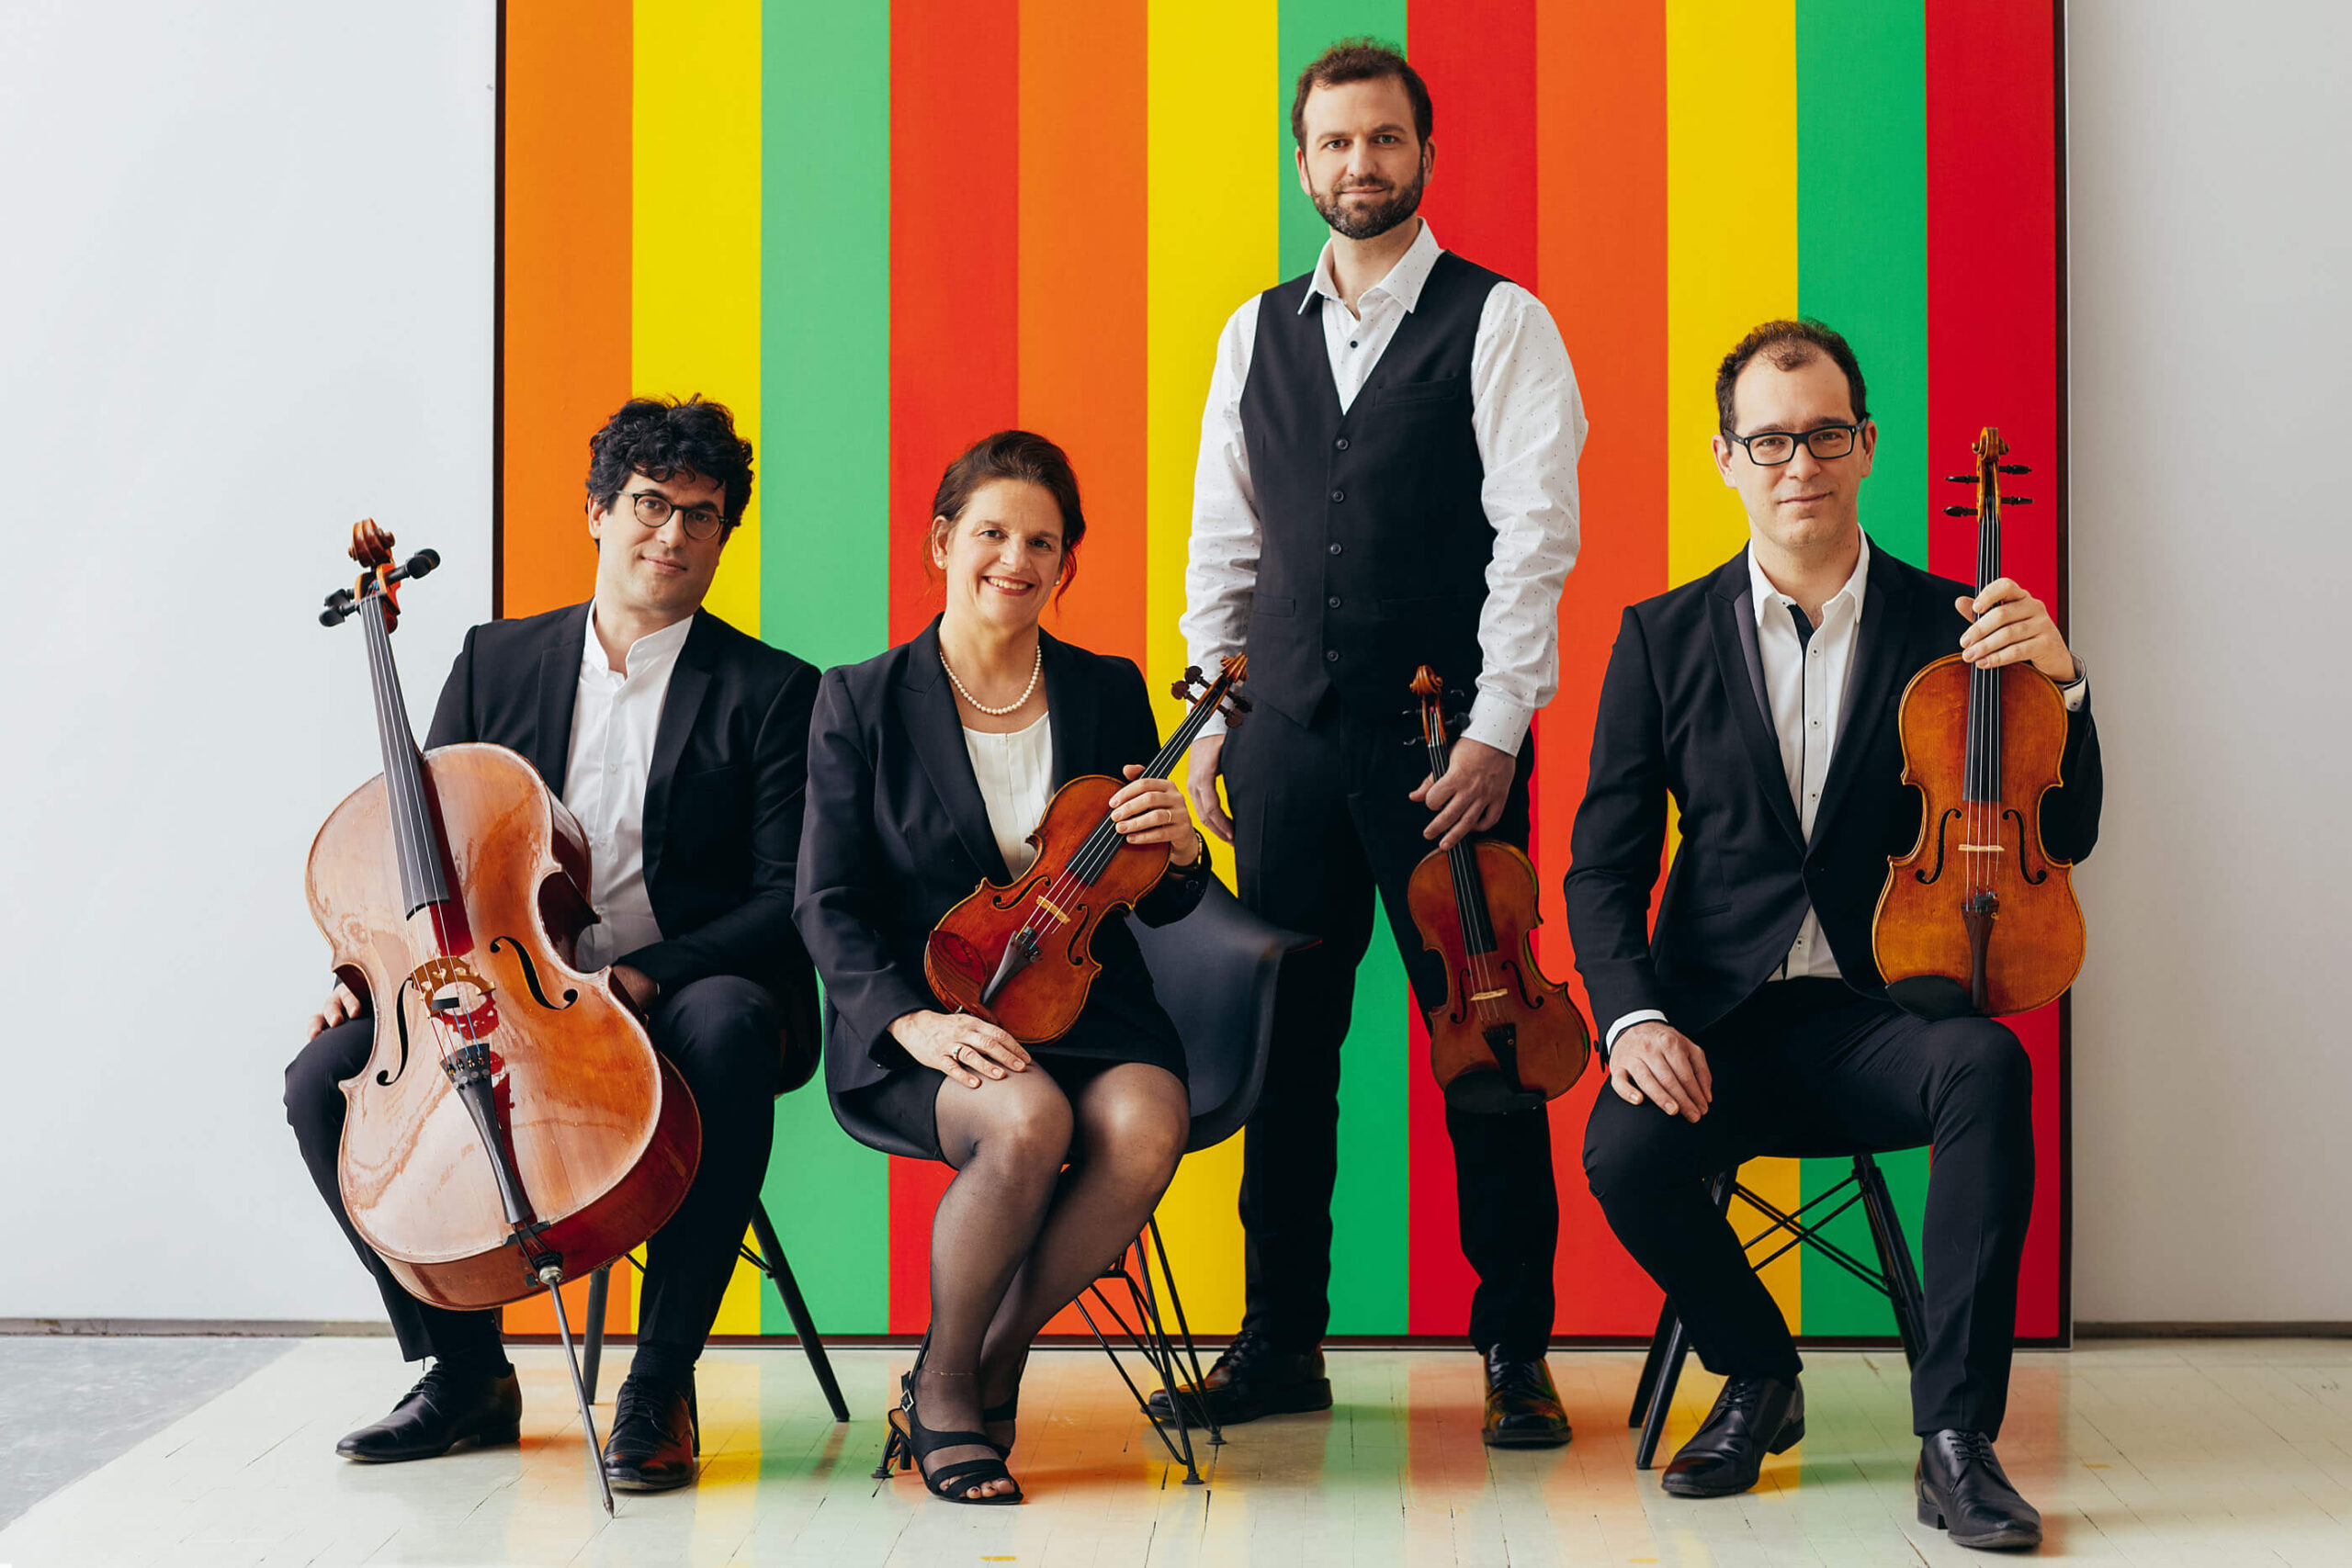 Quatuor Molinari 2018 photo